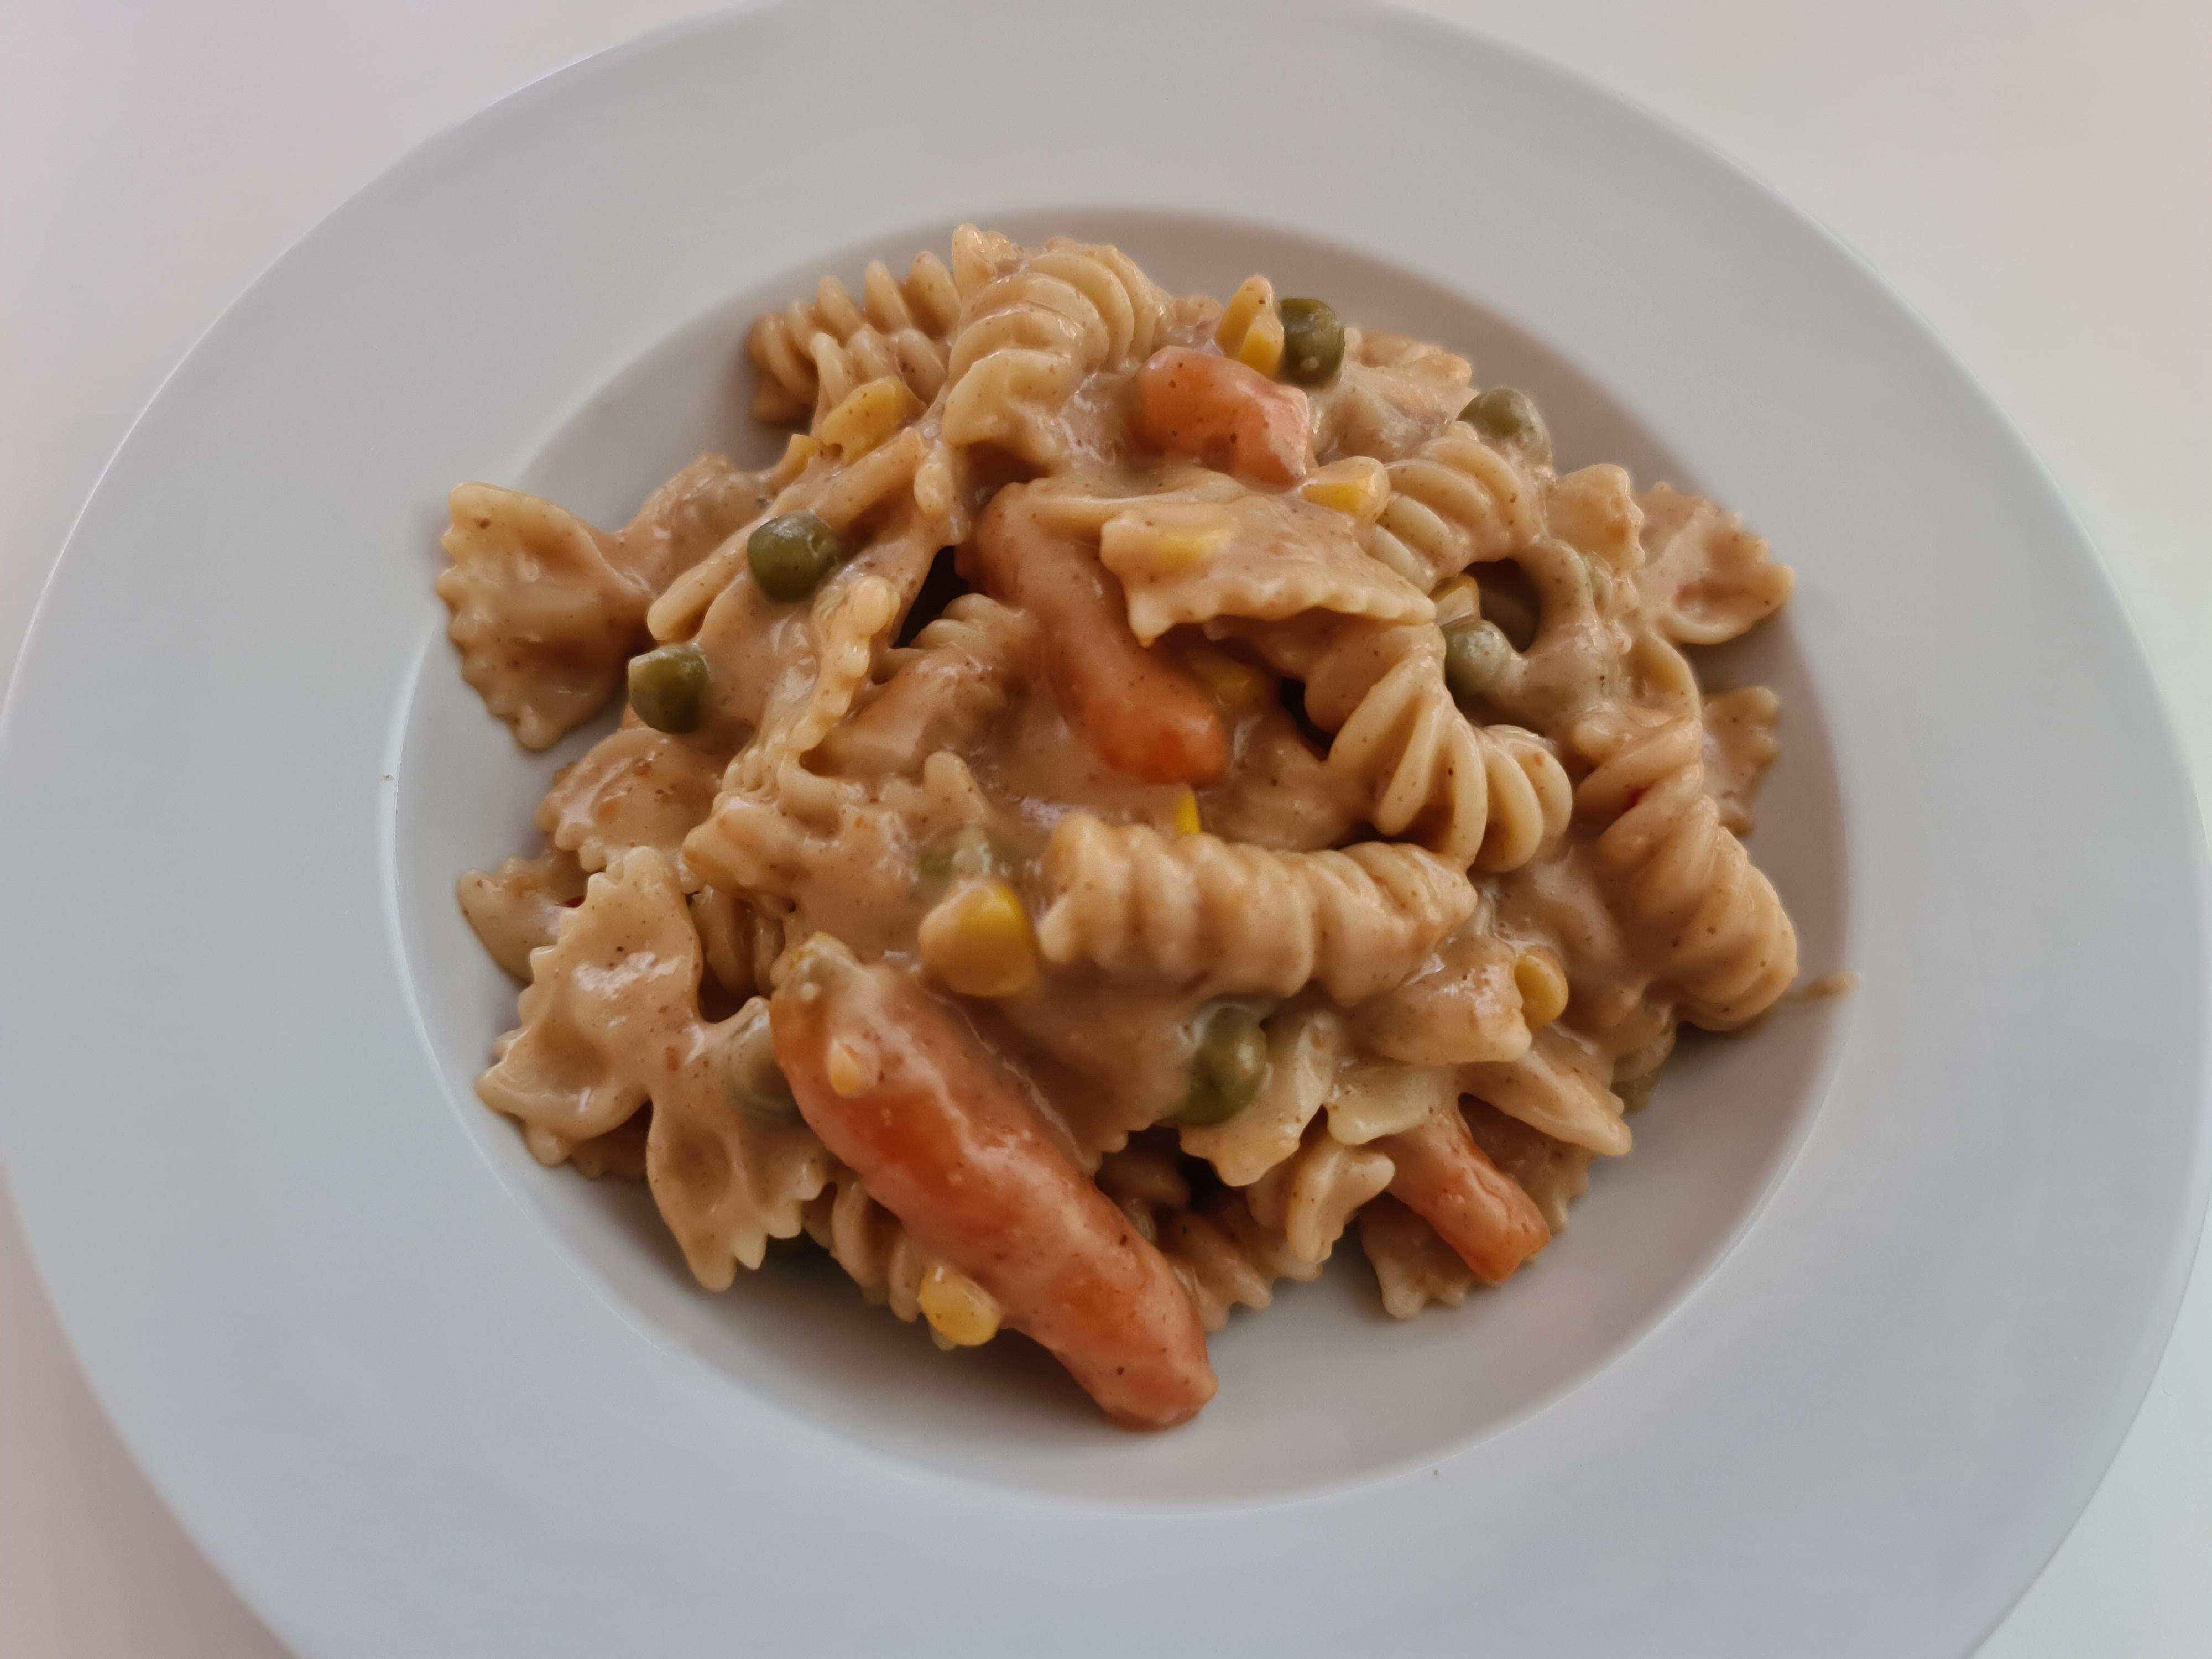 https://foodloader.net/Holz_2020-04-04_Fusilli_e_Farfalle_Sate_con_le_Verdure.jpg